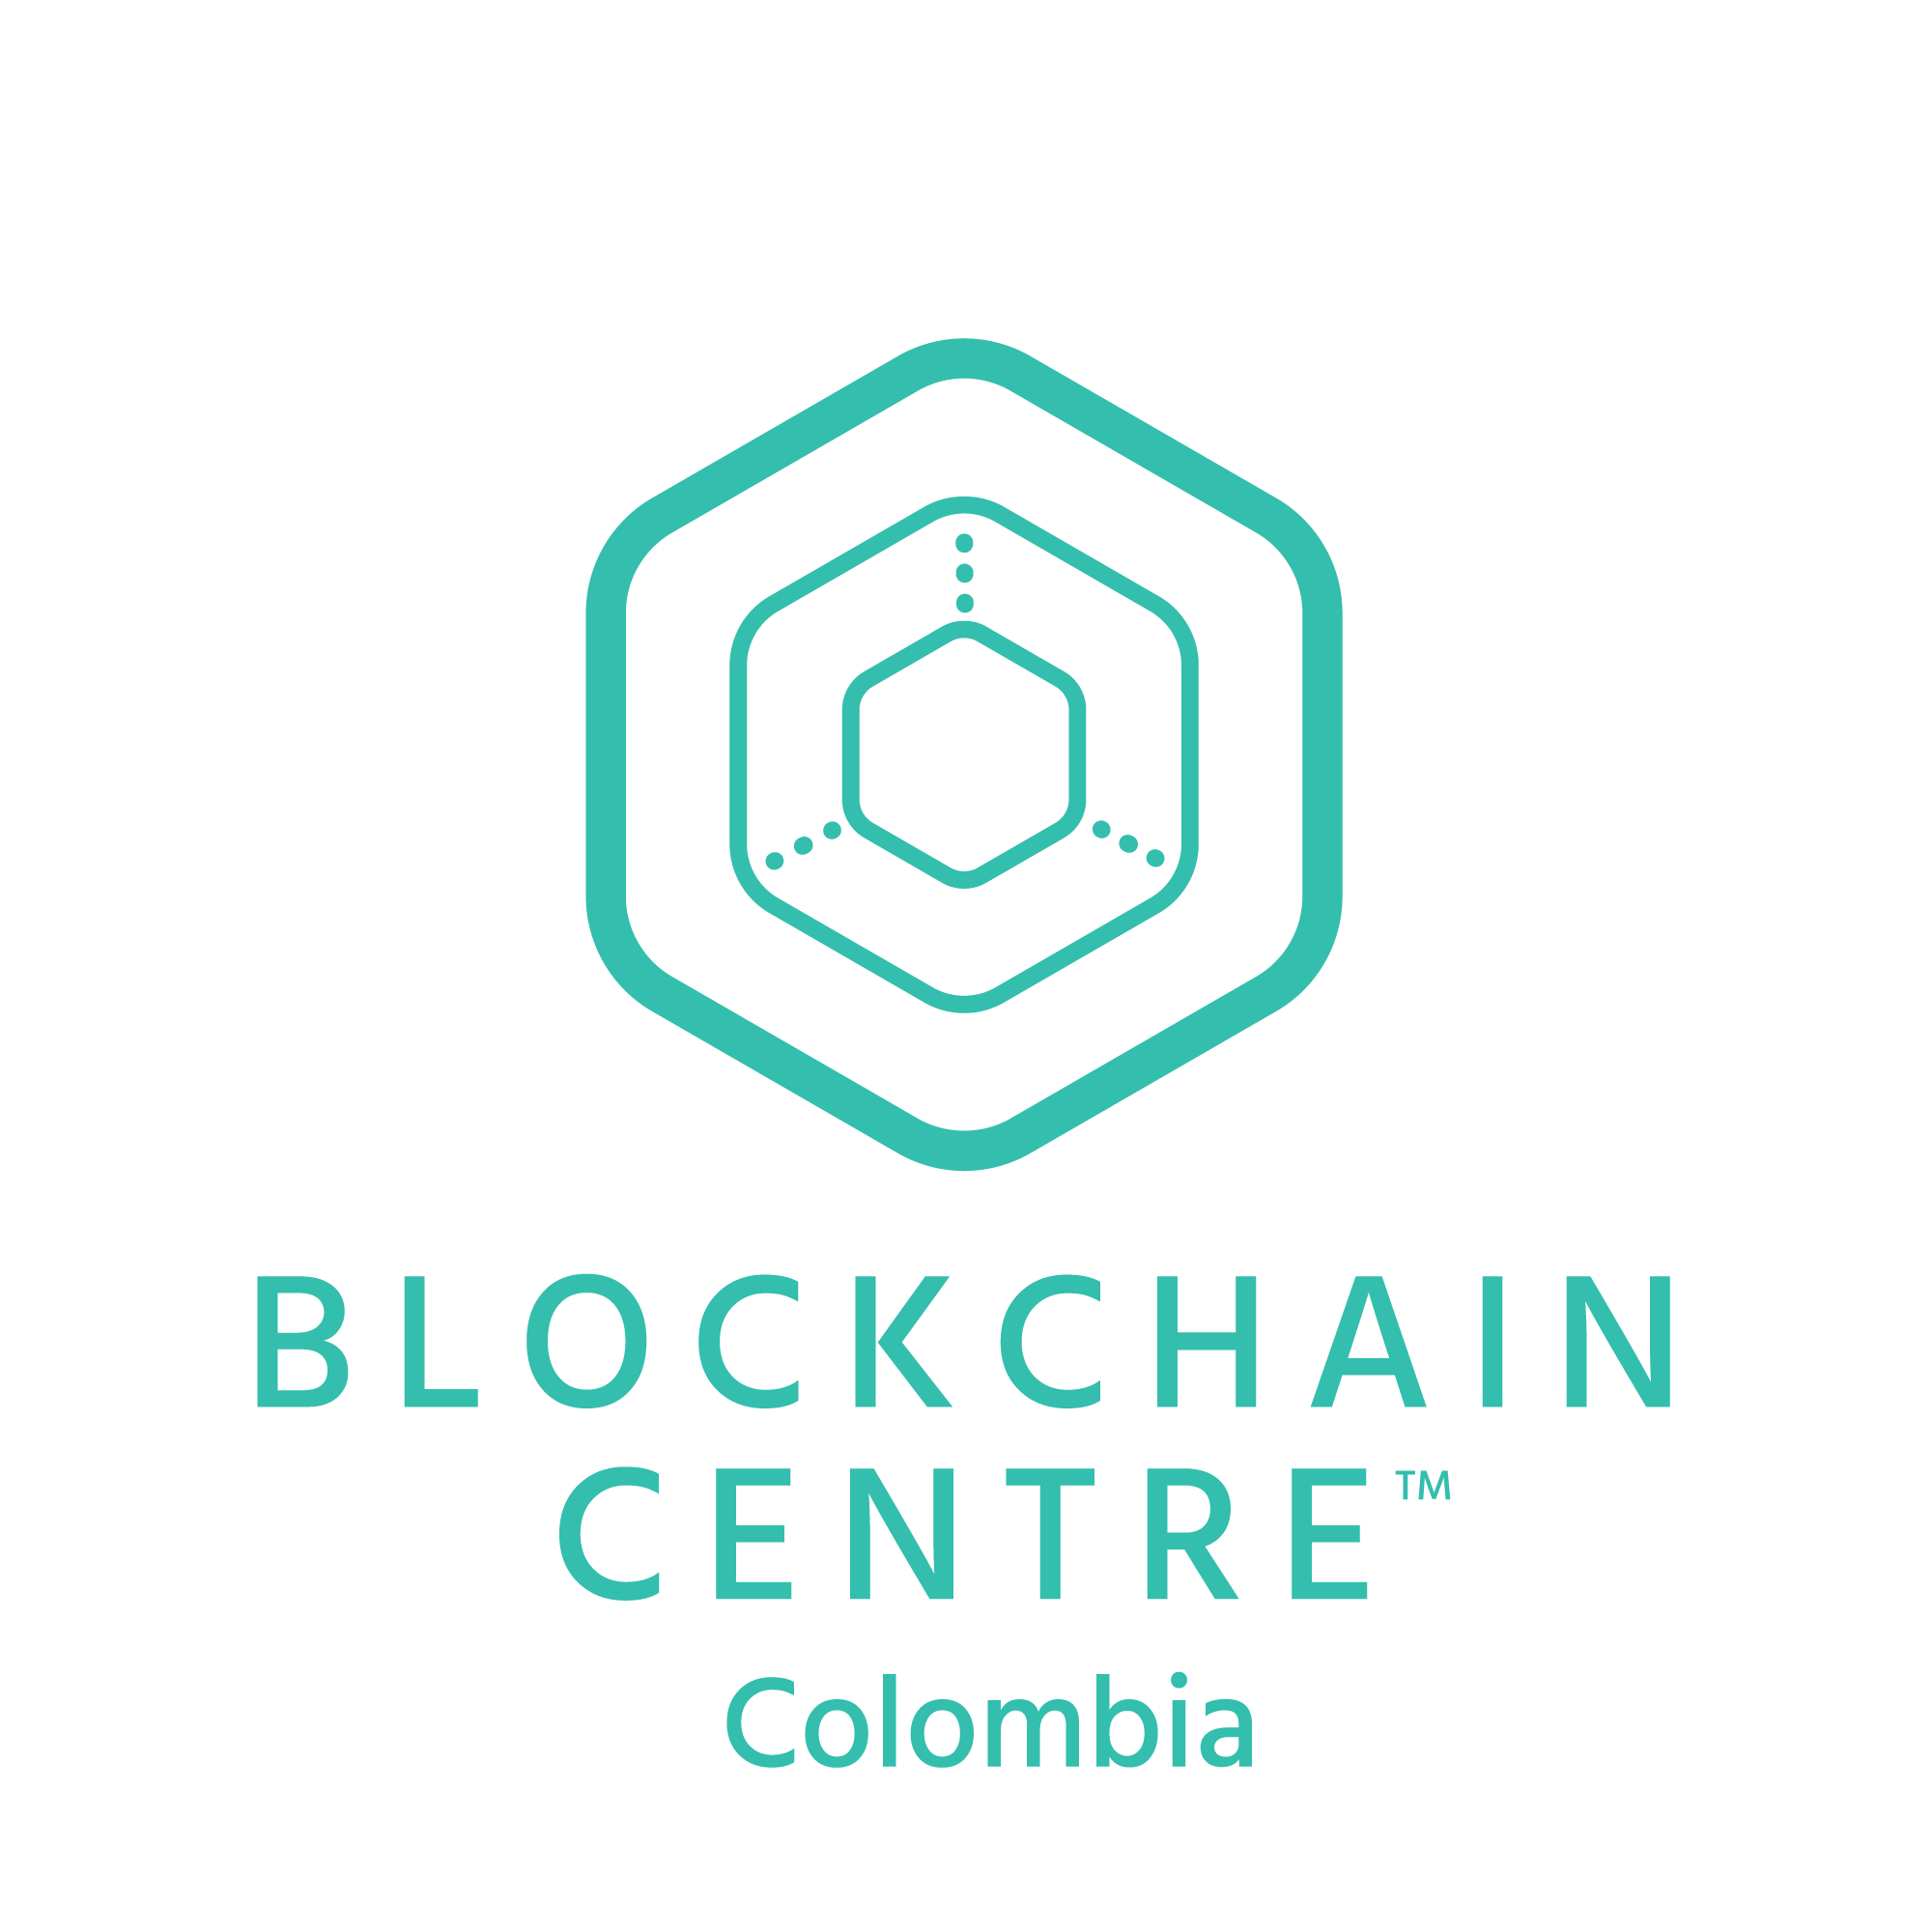 Blockchaincentrecolombialogo15356396161535639616